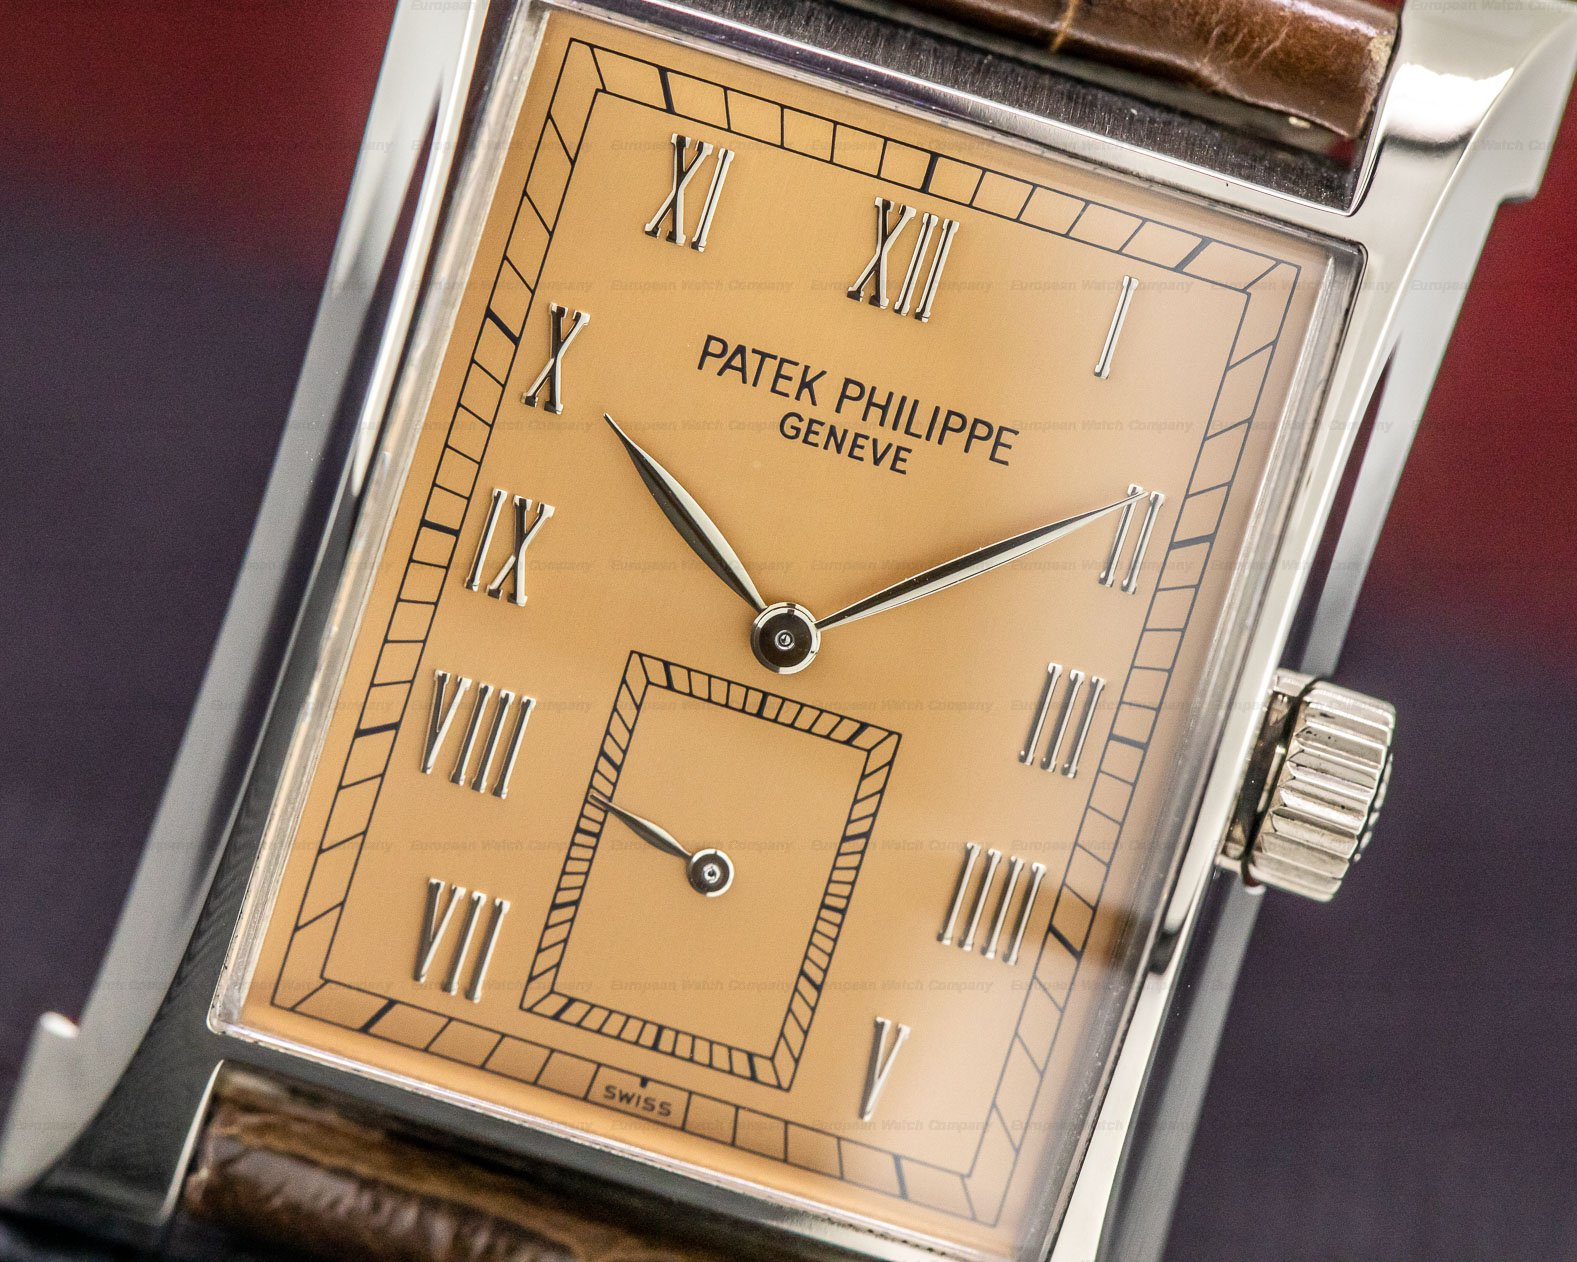 Patek Philippe 5500G Pagoda 18K White Gold Limited FULL SET